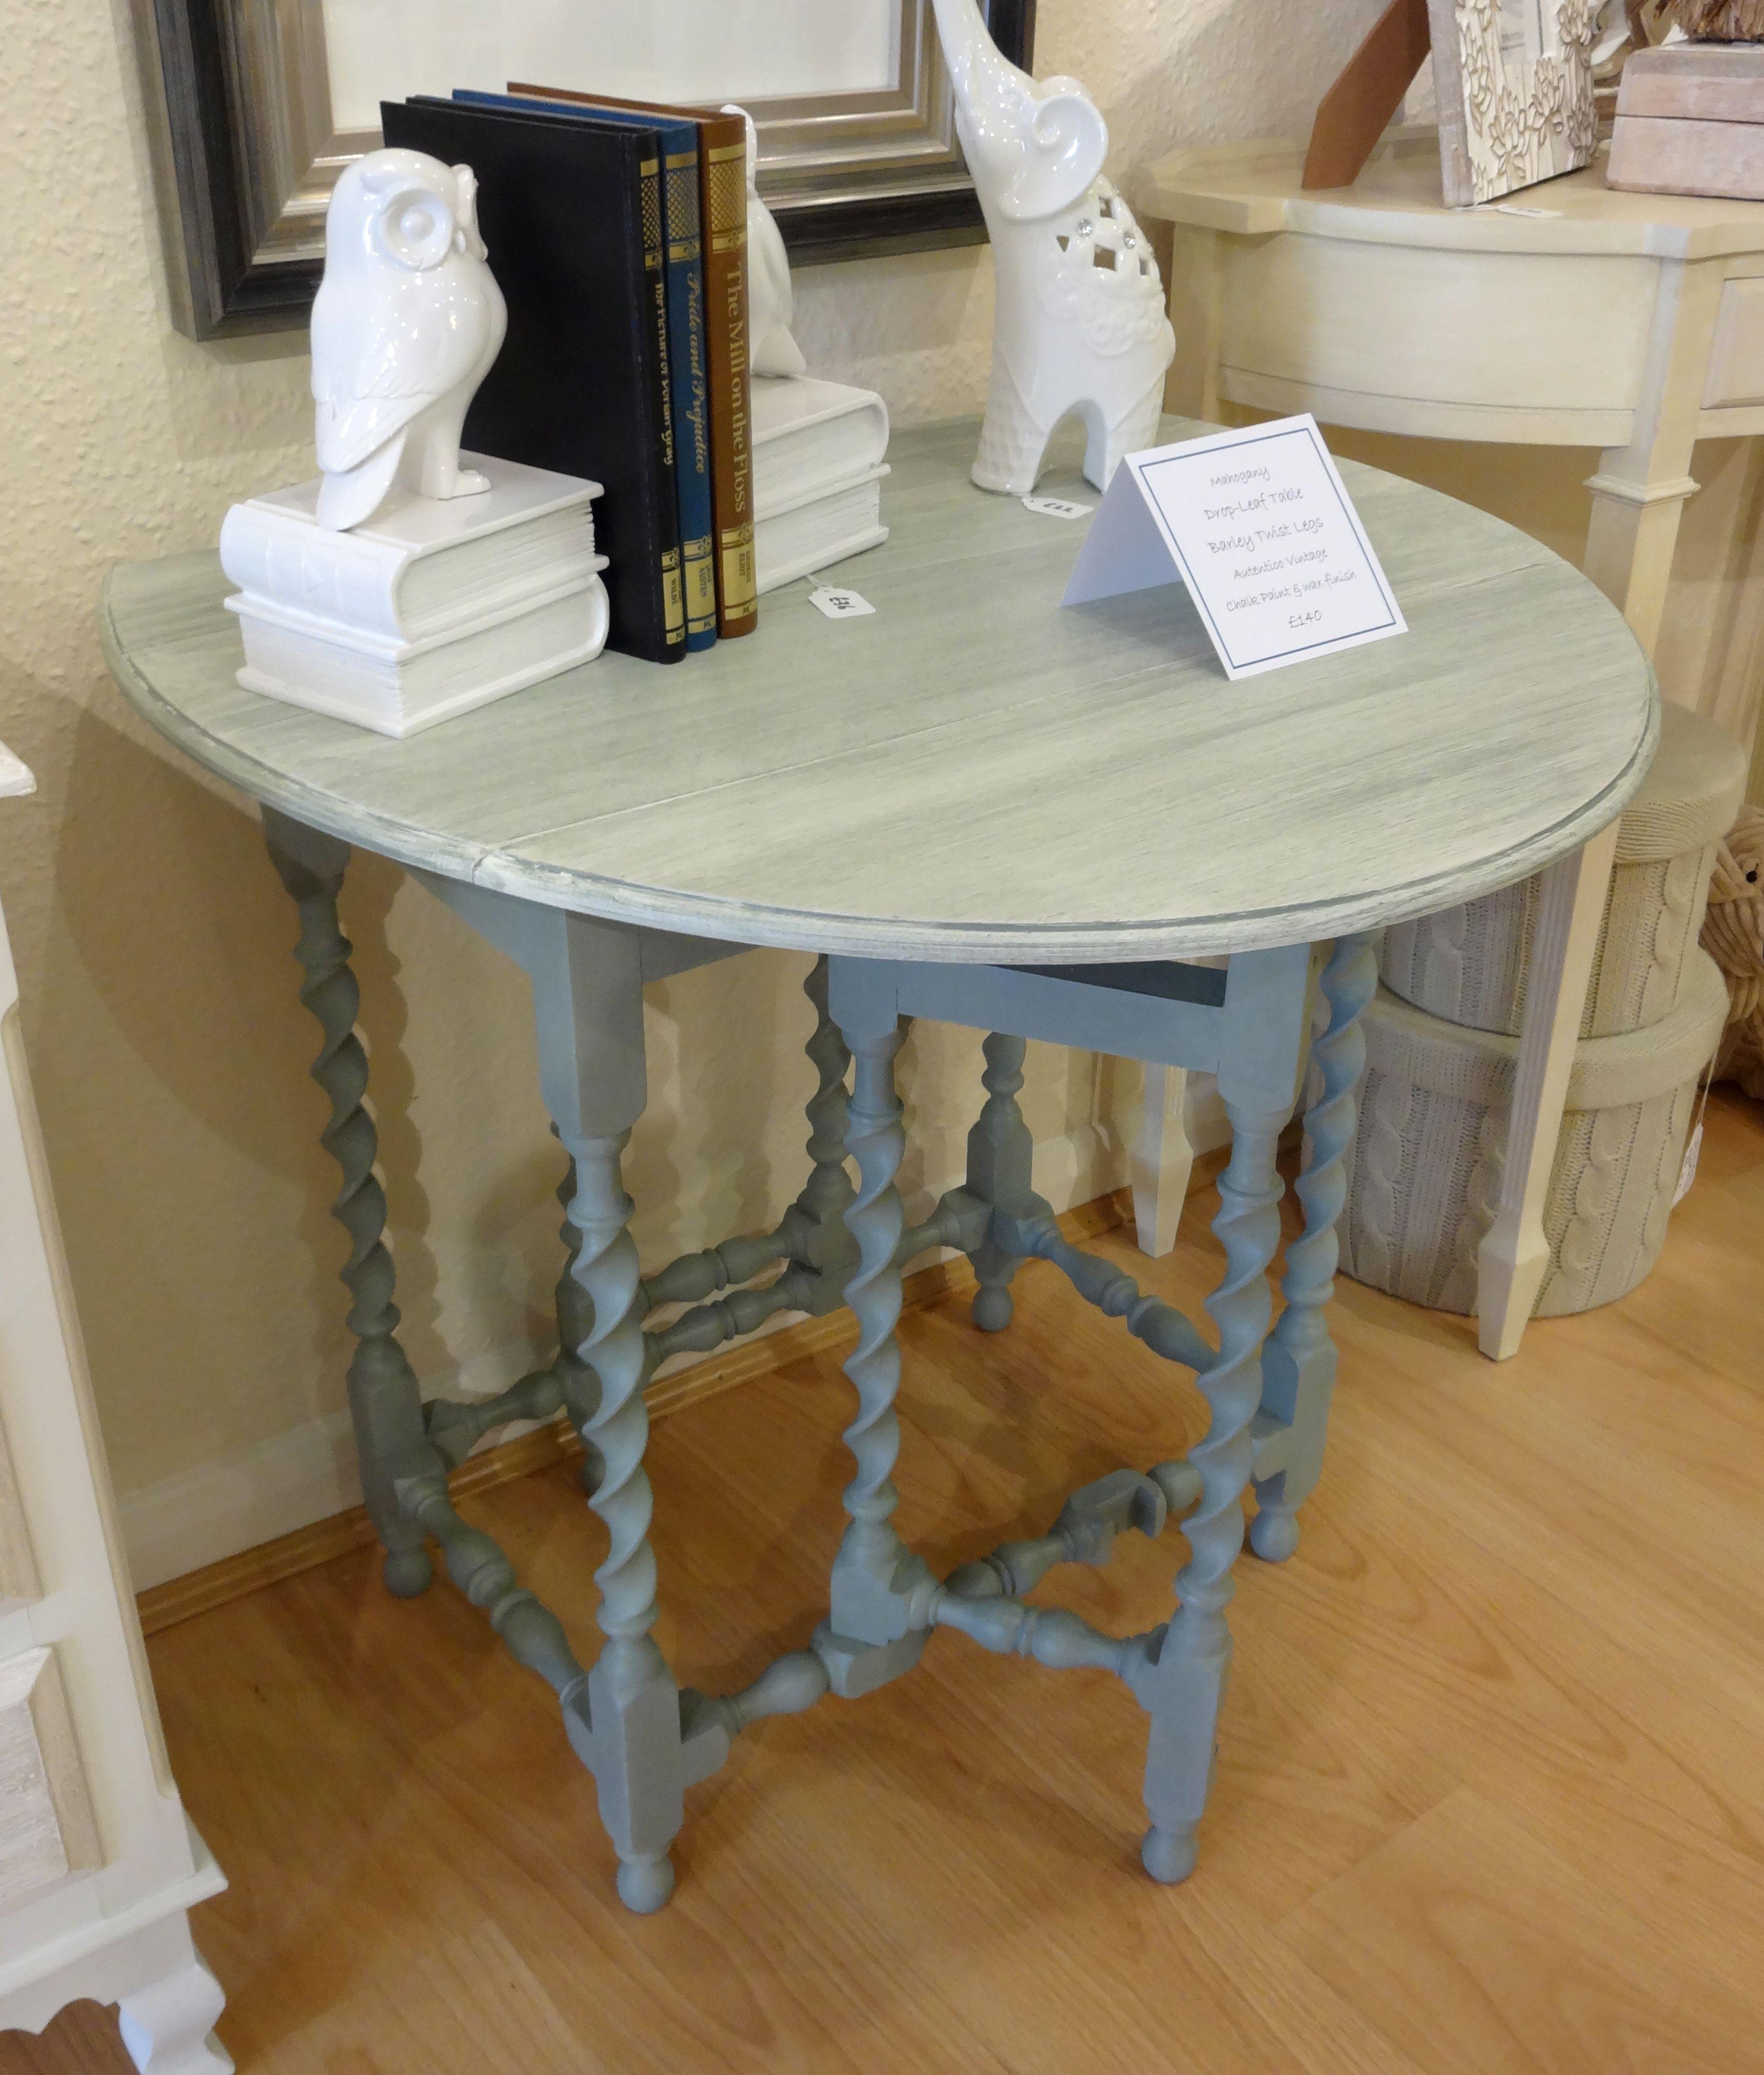 Oval oak gate-leg table with barley-twist legs, painted using ...